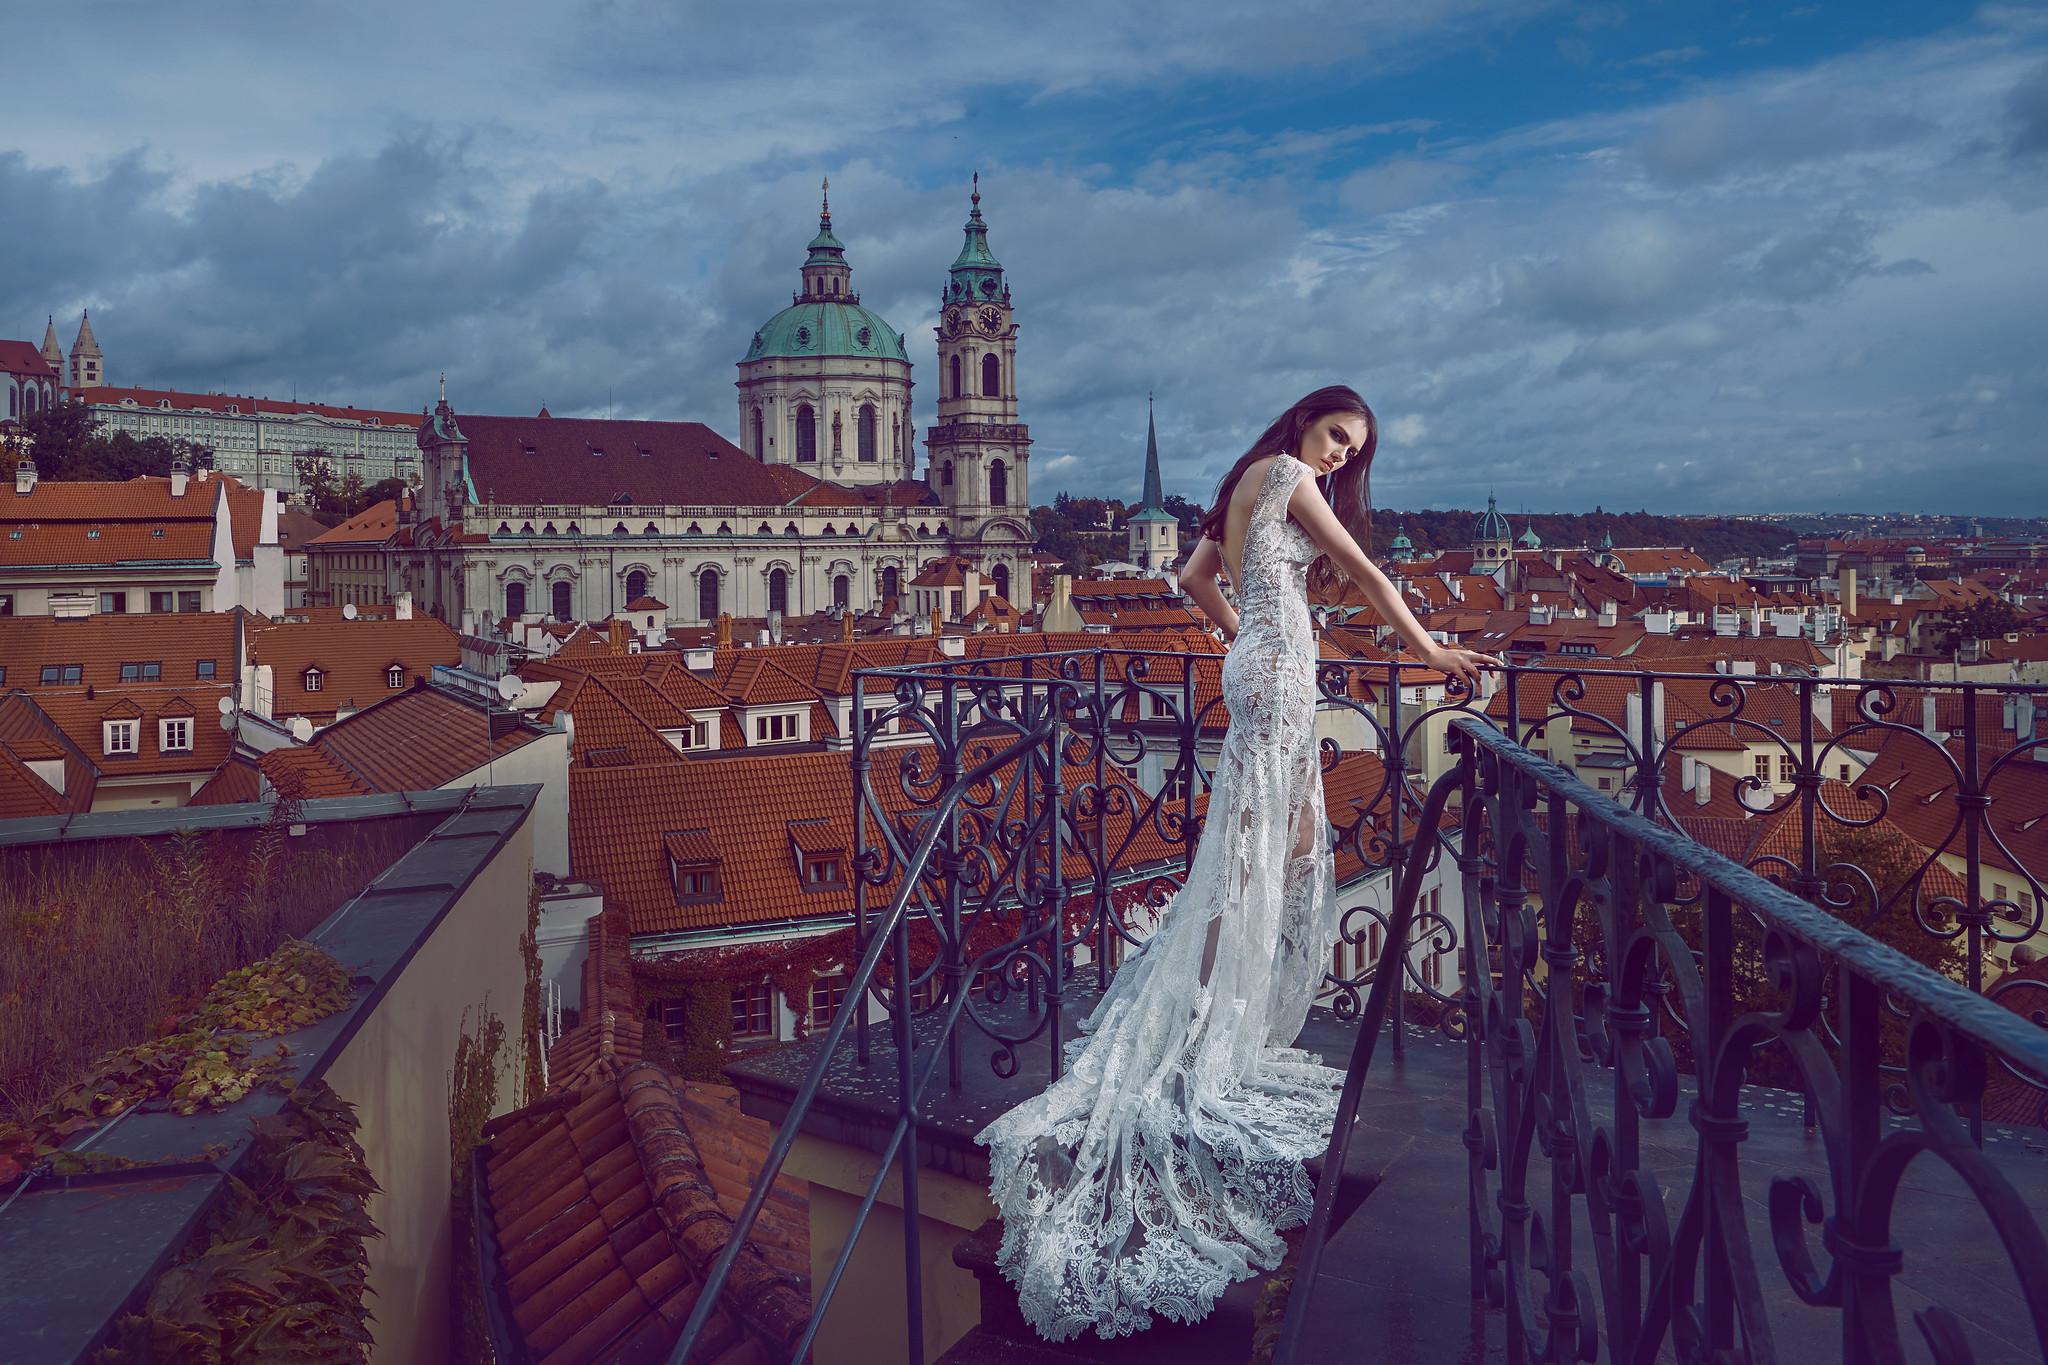 Donfer Photography, EASTERN WEDDING, 東法, 布拉格婚紗, 海外婚紗, 藝術婚紗, 布拉格婚紗, Praha, 查理大橋